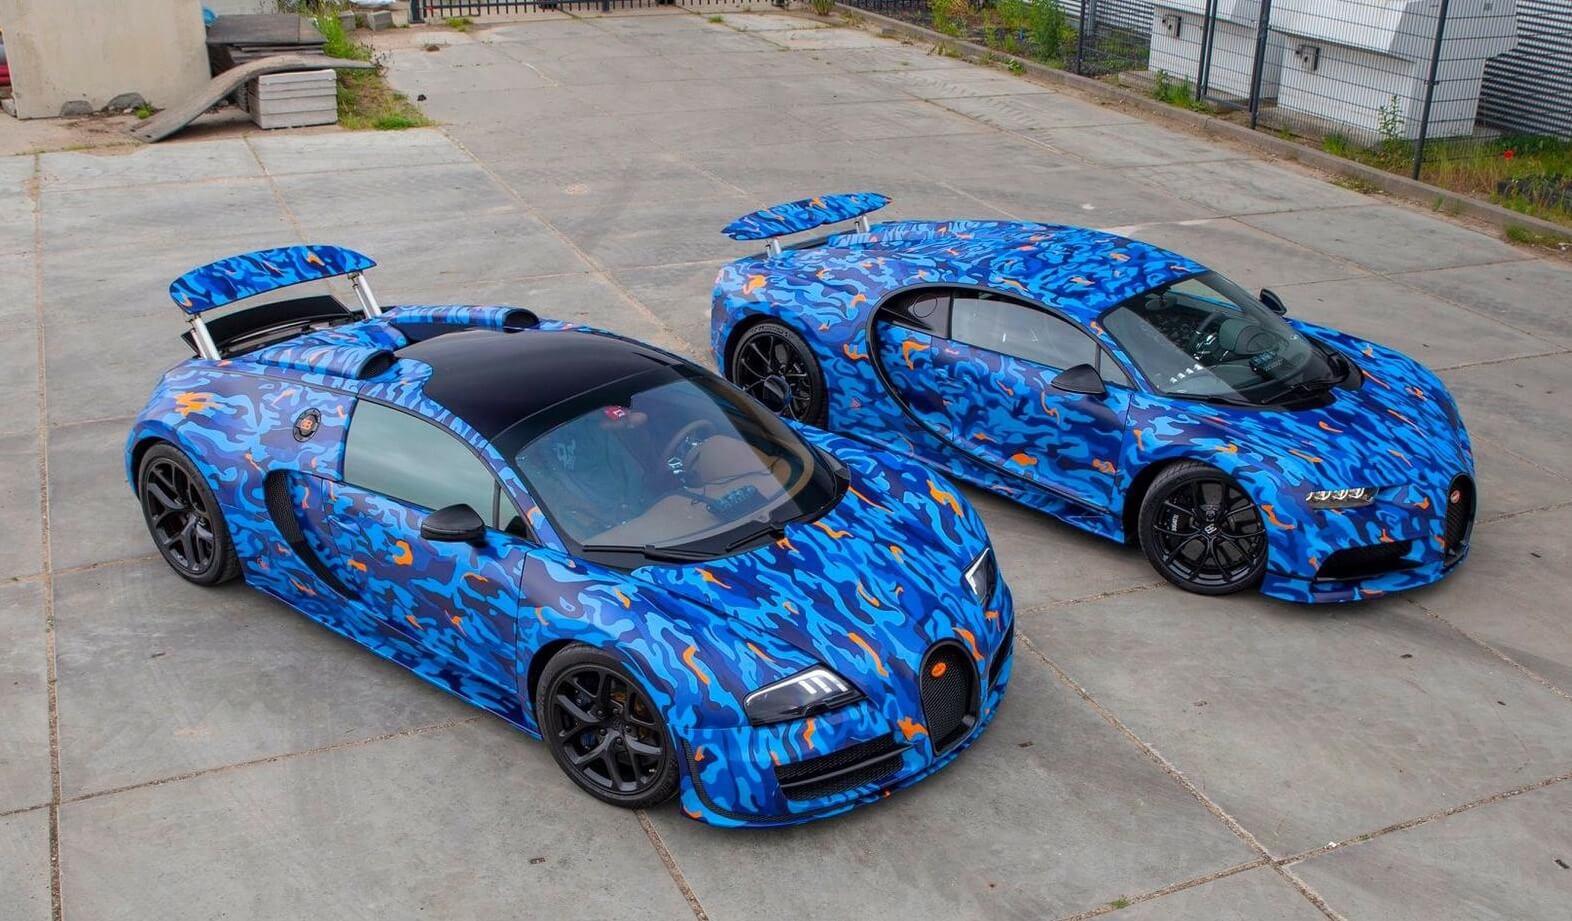 Autowrap carwrapping Bugatti Gumball Rally